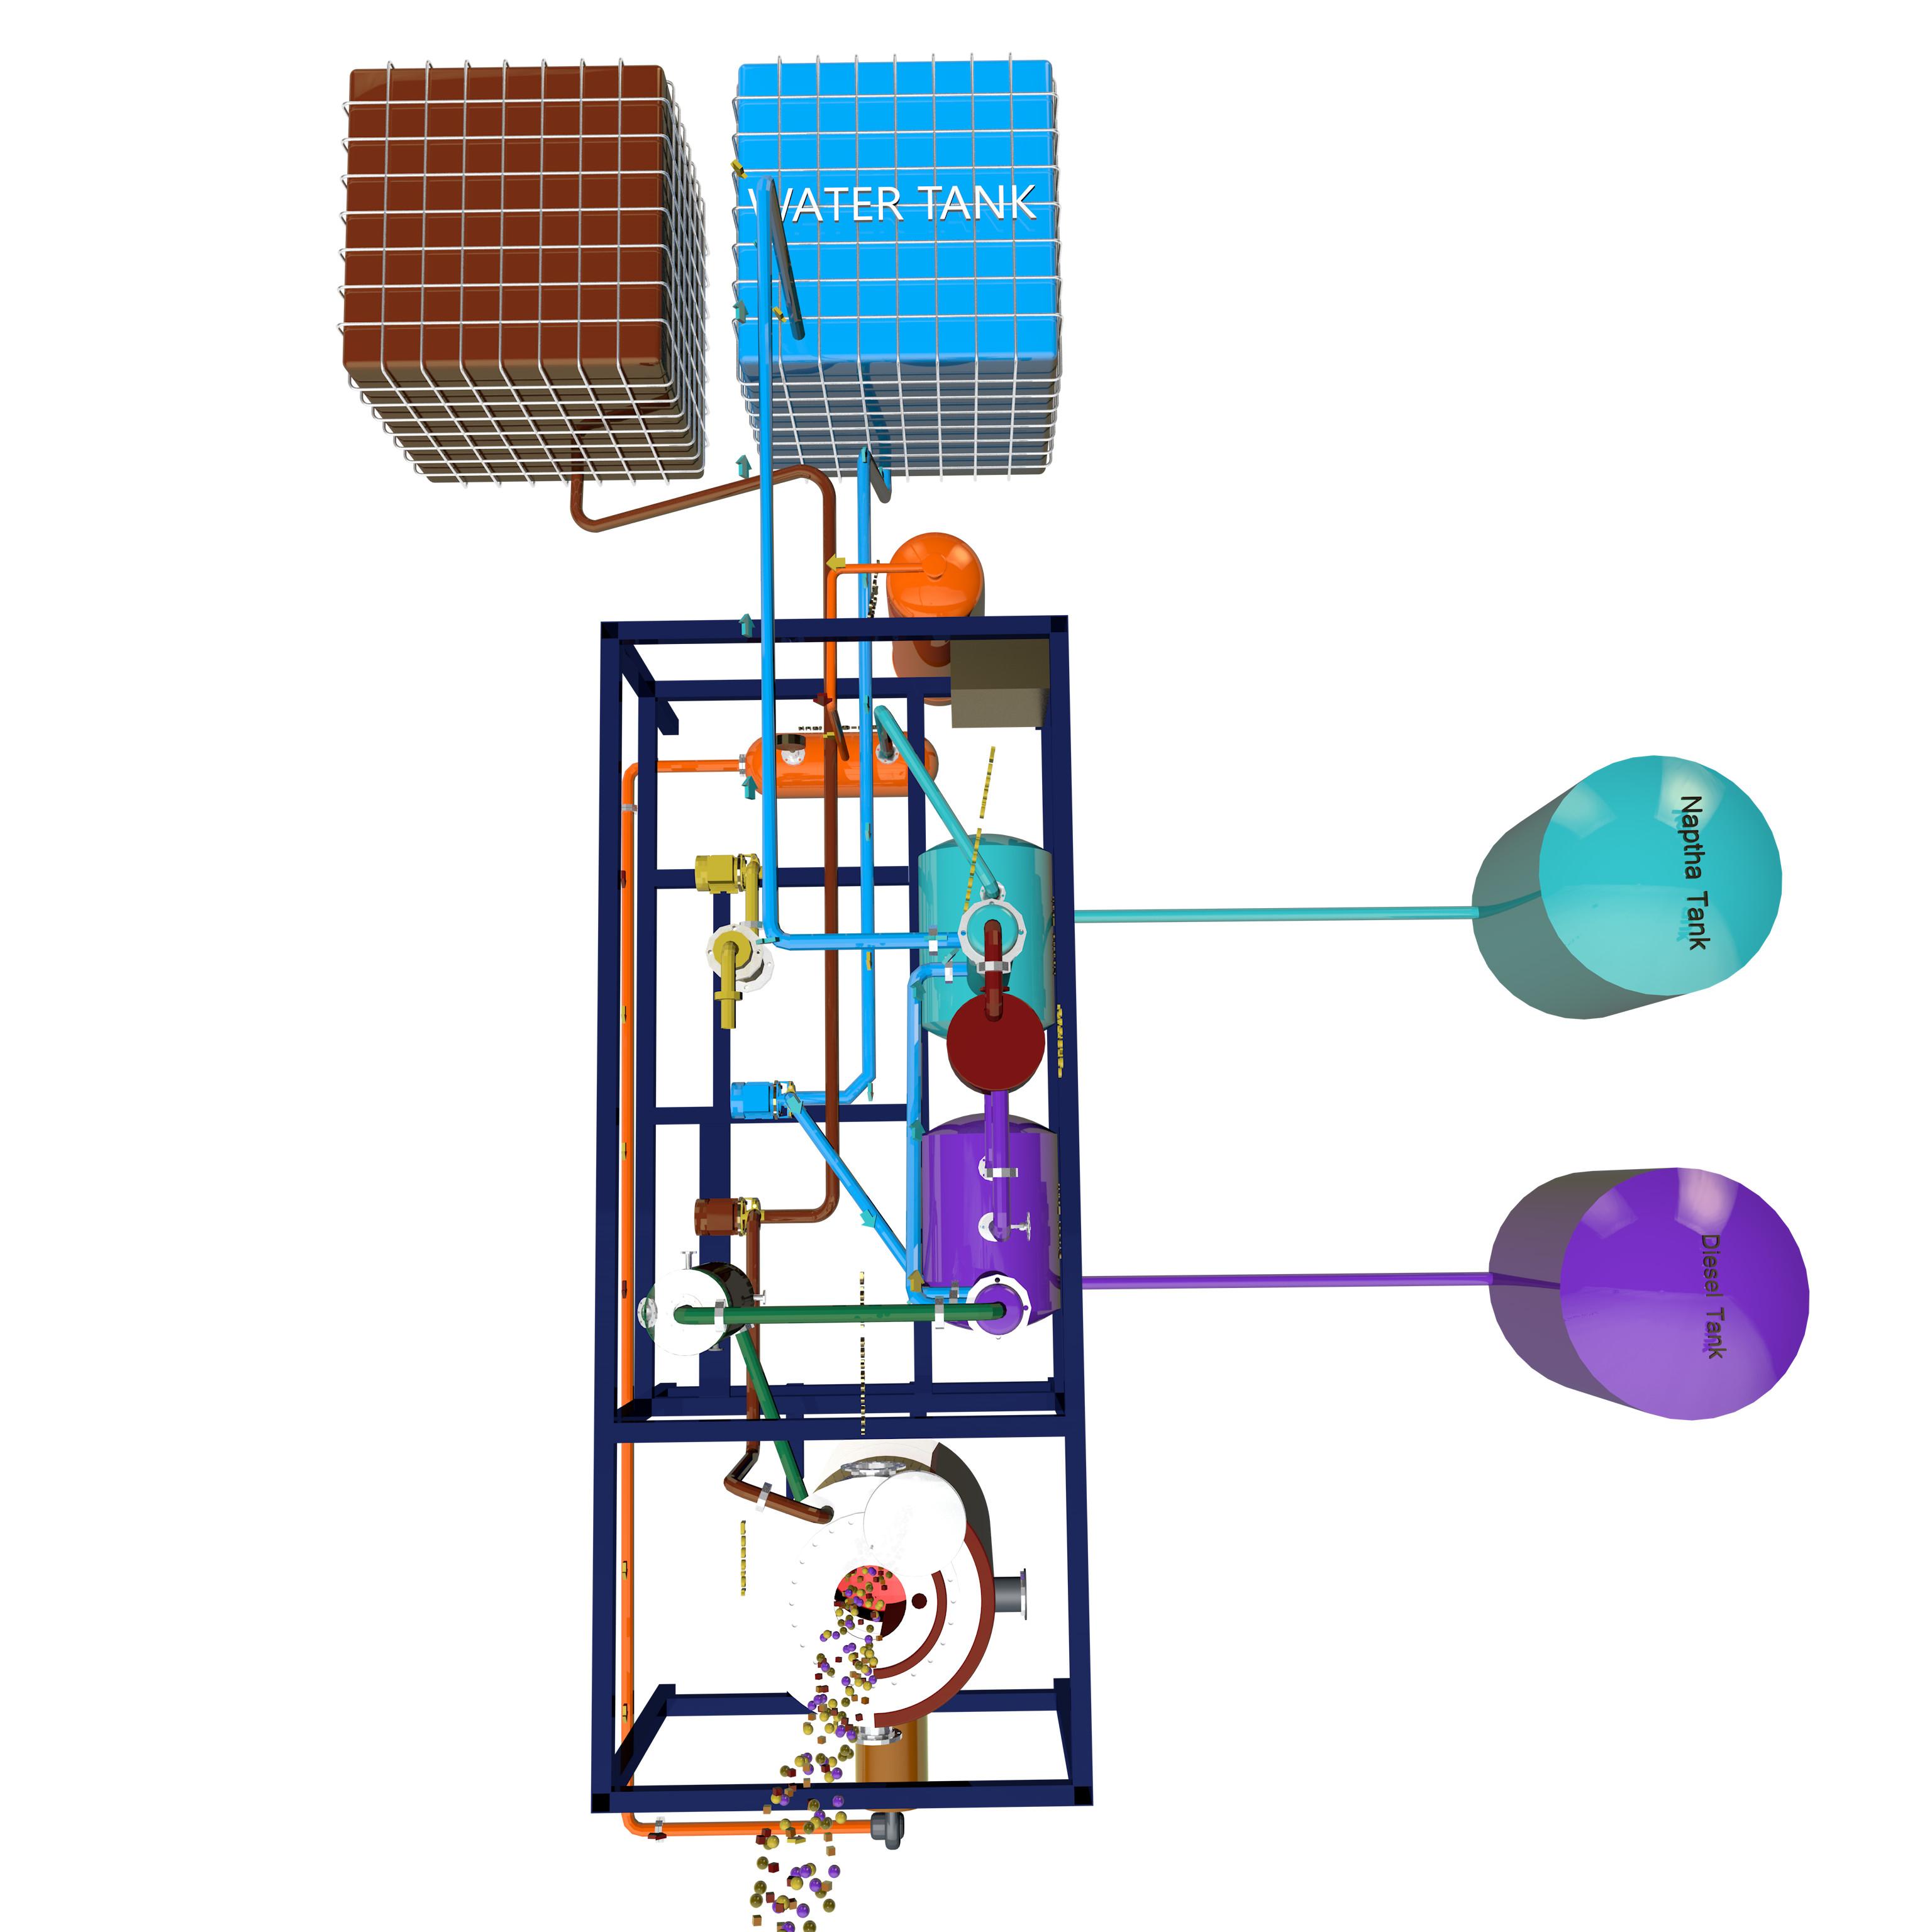 250 liter per day waste motor oil pyrolysis plant - Pyrolyze com